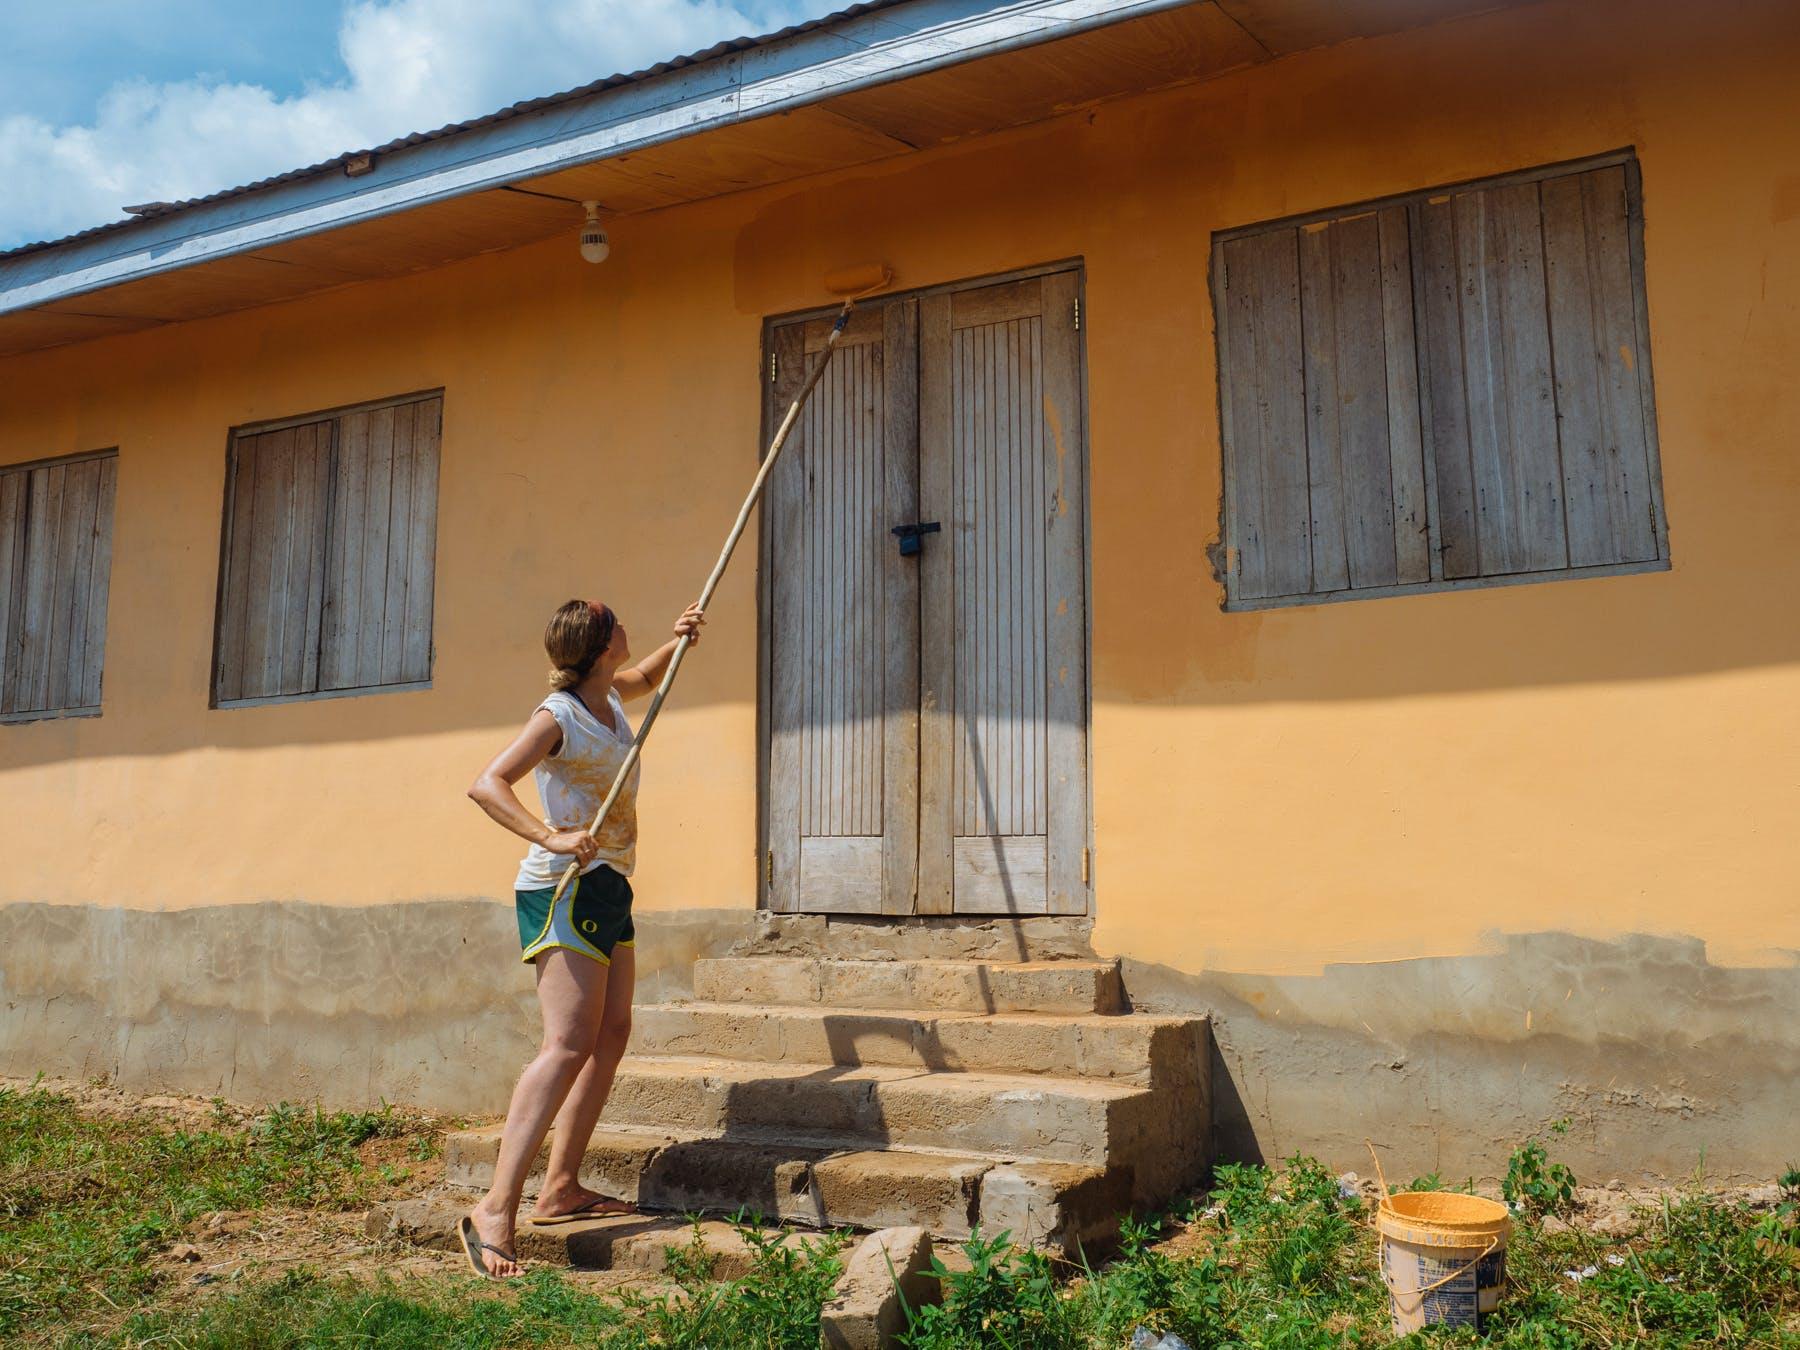 Construction and Renovation Volunteer Program in Tanzania - Arusha